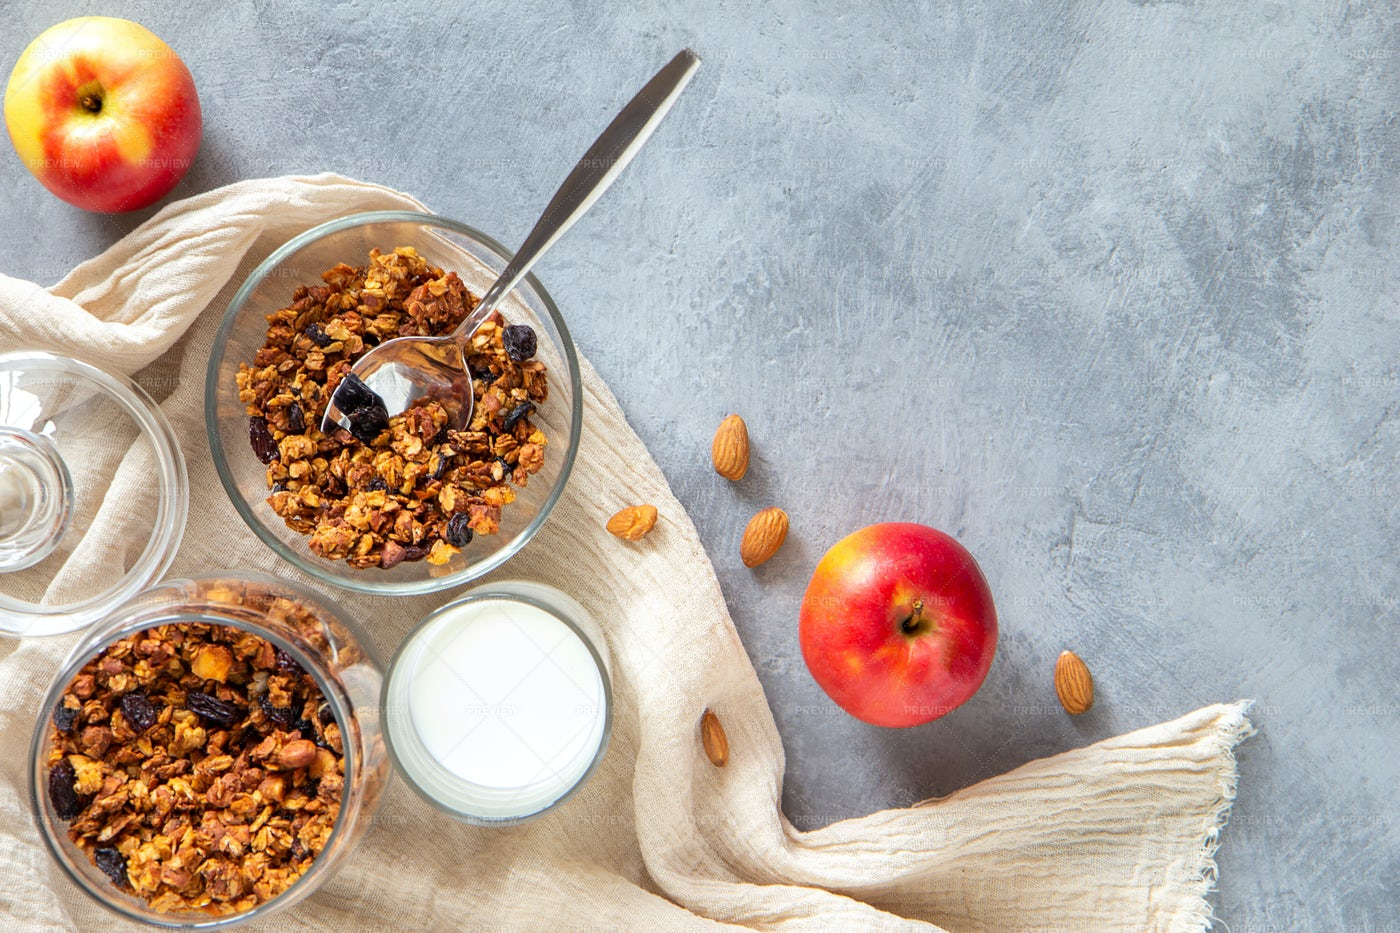 Apple Bseide Granola Bowls: Stock Photos